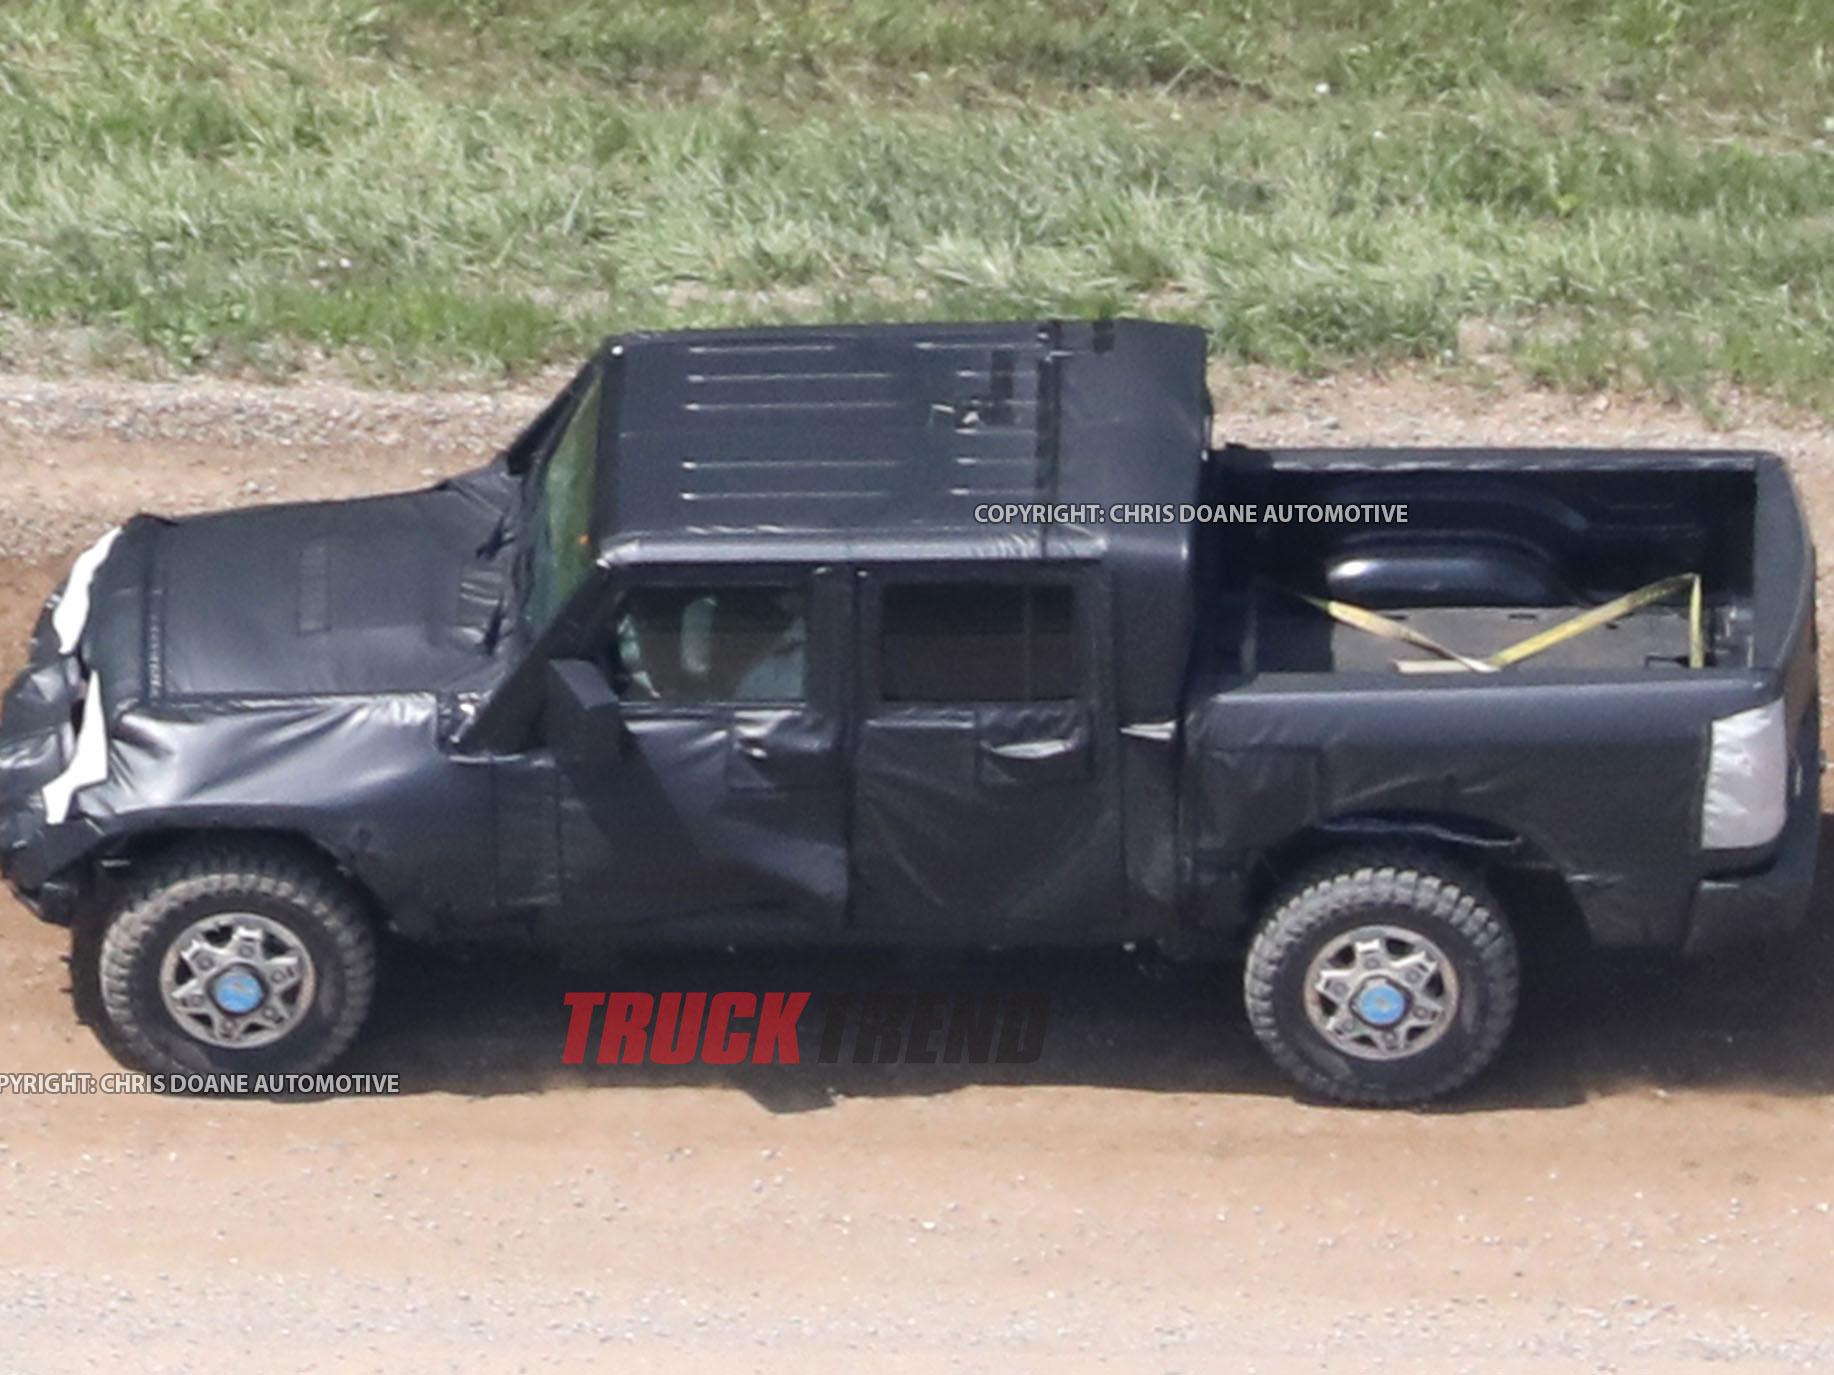 2019 Jeep Wrangler JL Pickup Spyshots 16